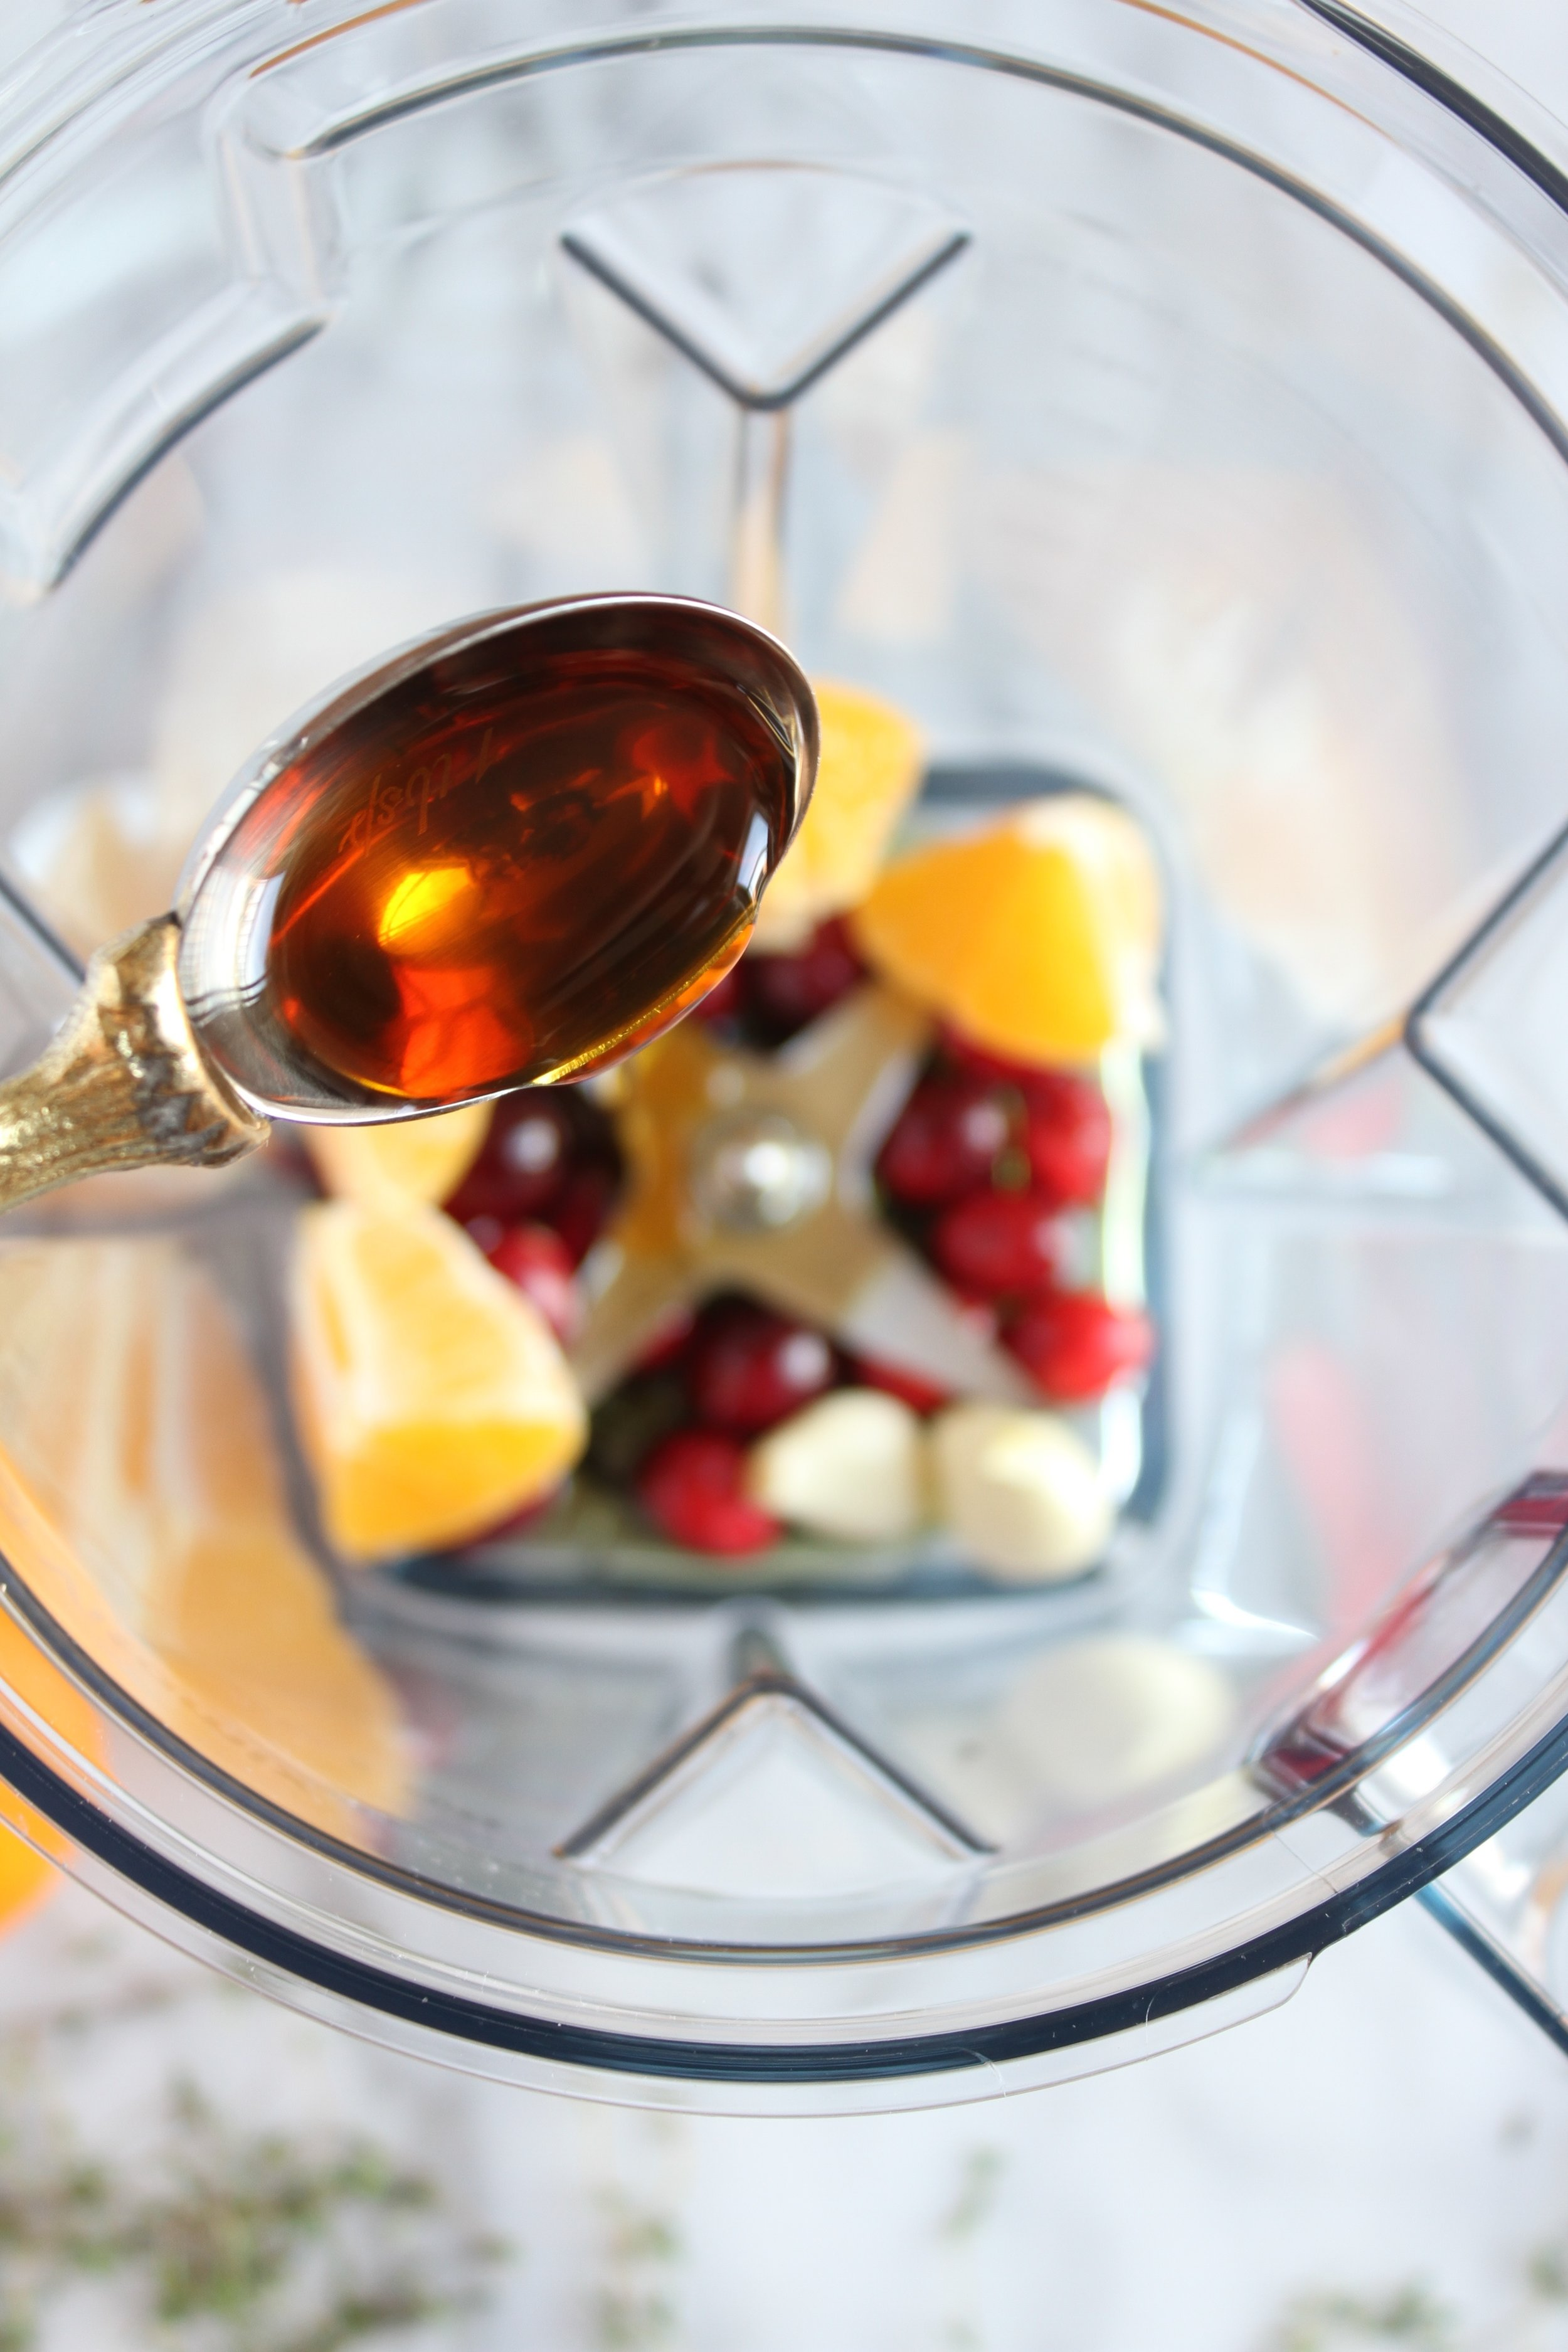 Roasted Cranberry Orange Maple Chicken w:Vitamix x Living Minnaly _17.jpg